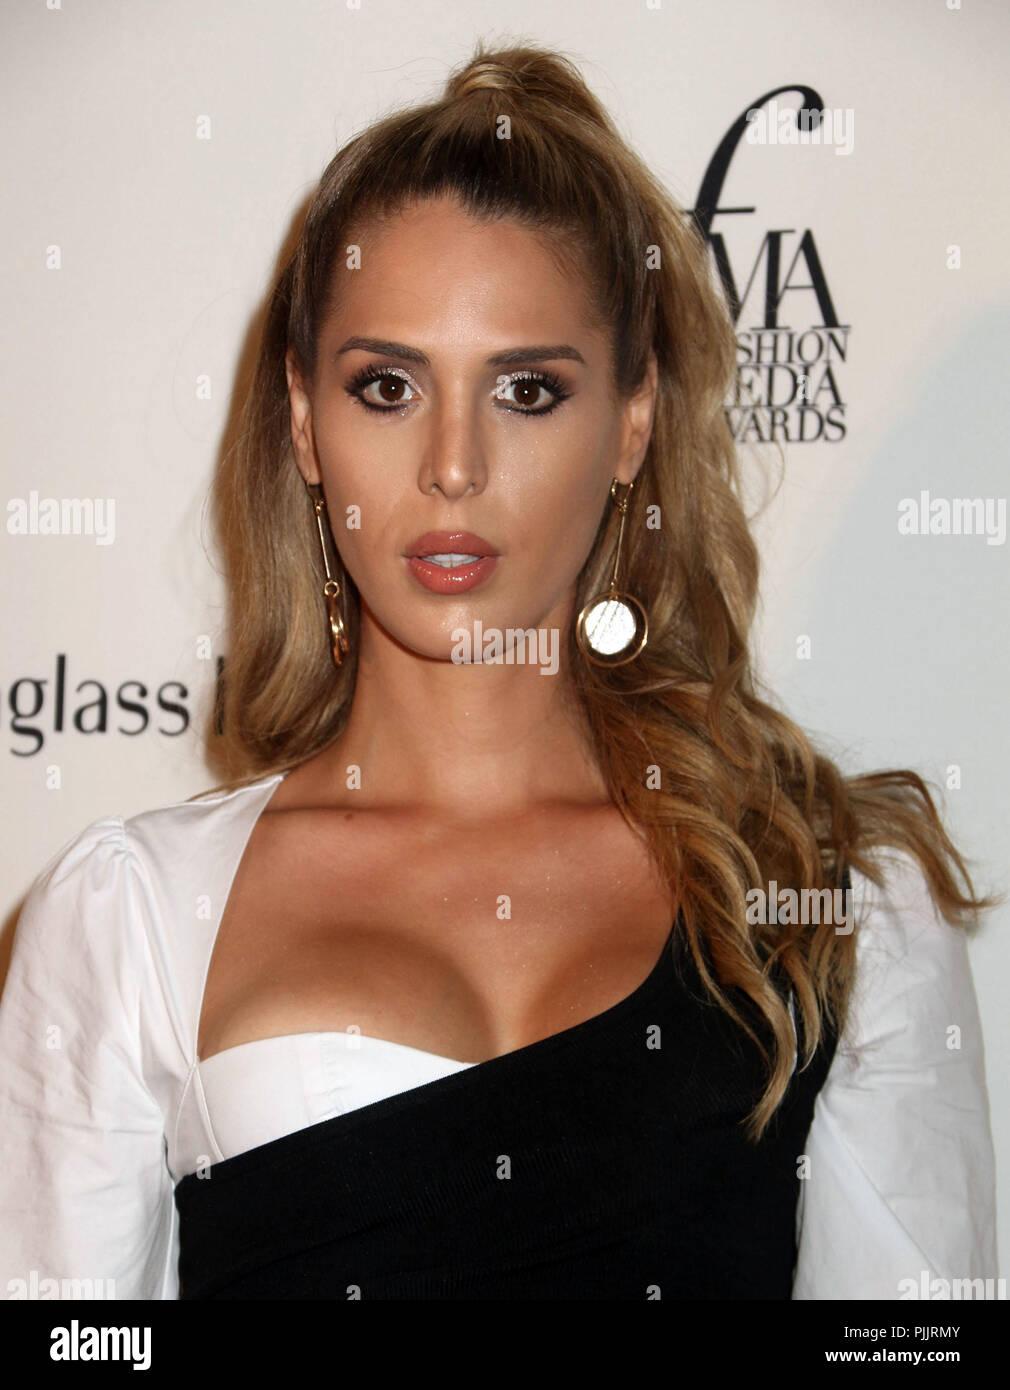 ICloud Nadine Vinzens nudes (95 photo), Sexy, Paparazzi, Twitter, cleavage 2019